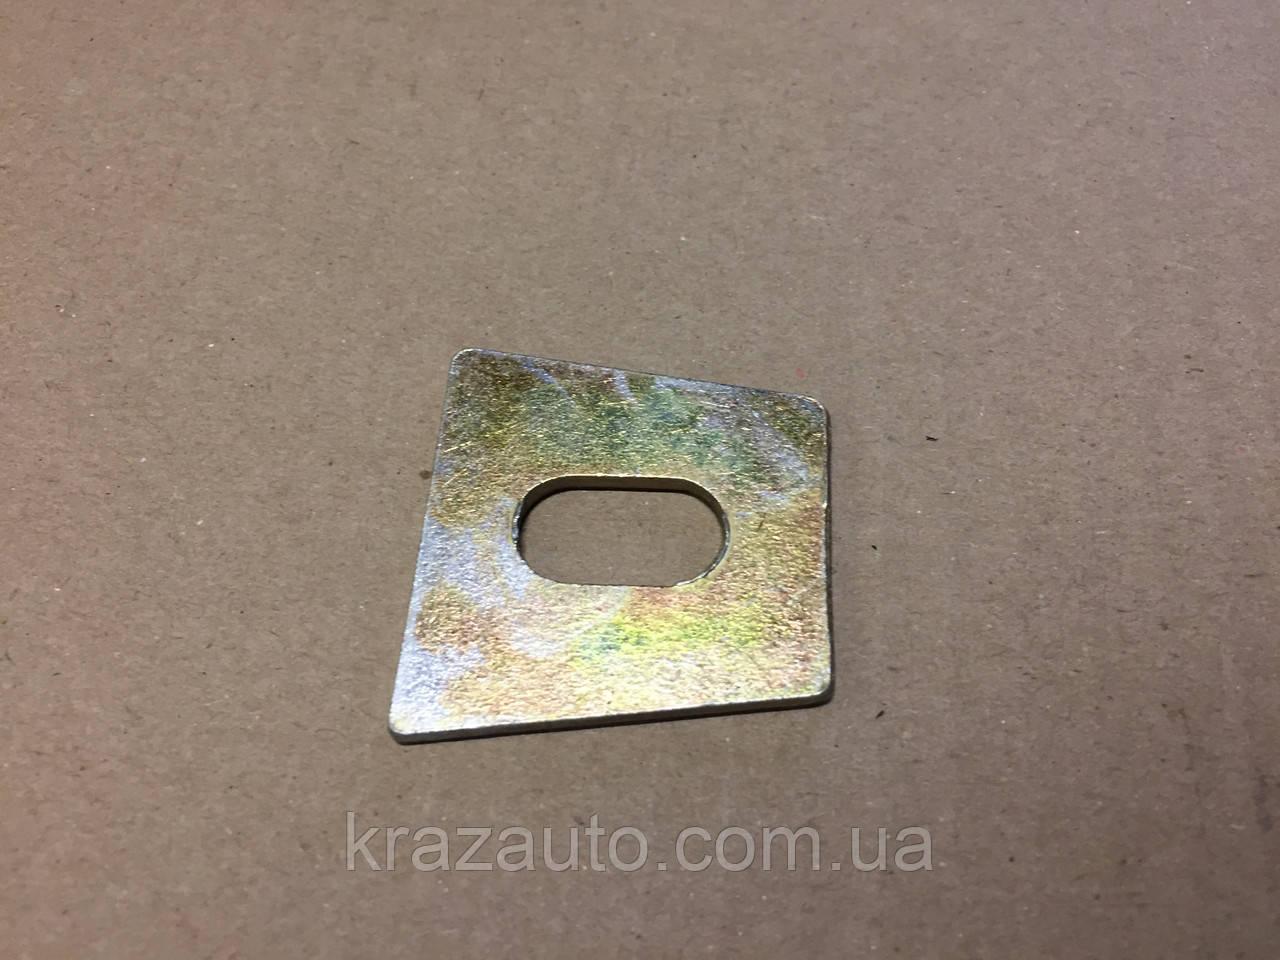 Стопор оси колодки МАЗ 5440-3501134